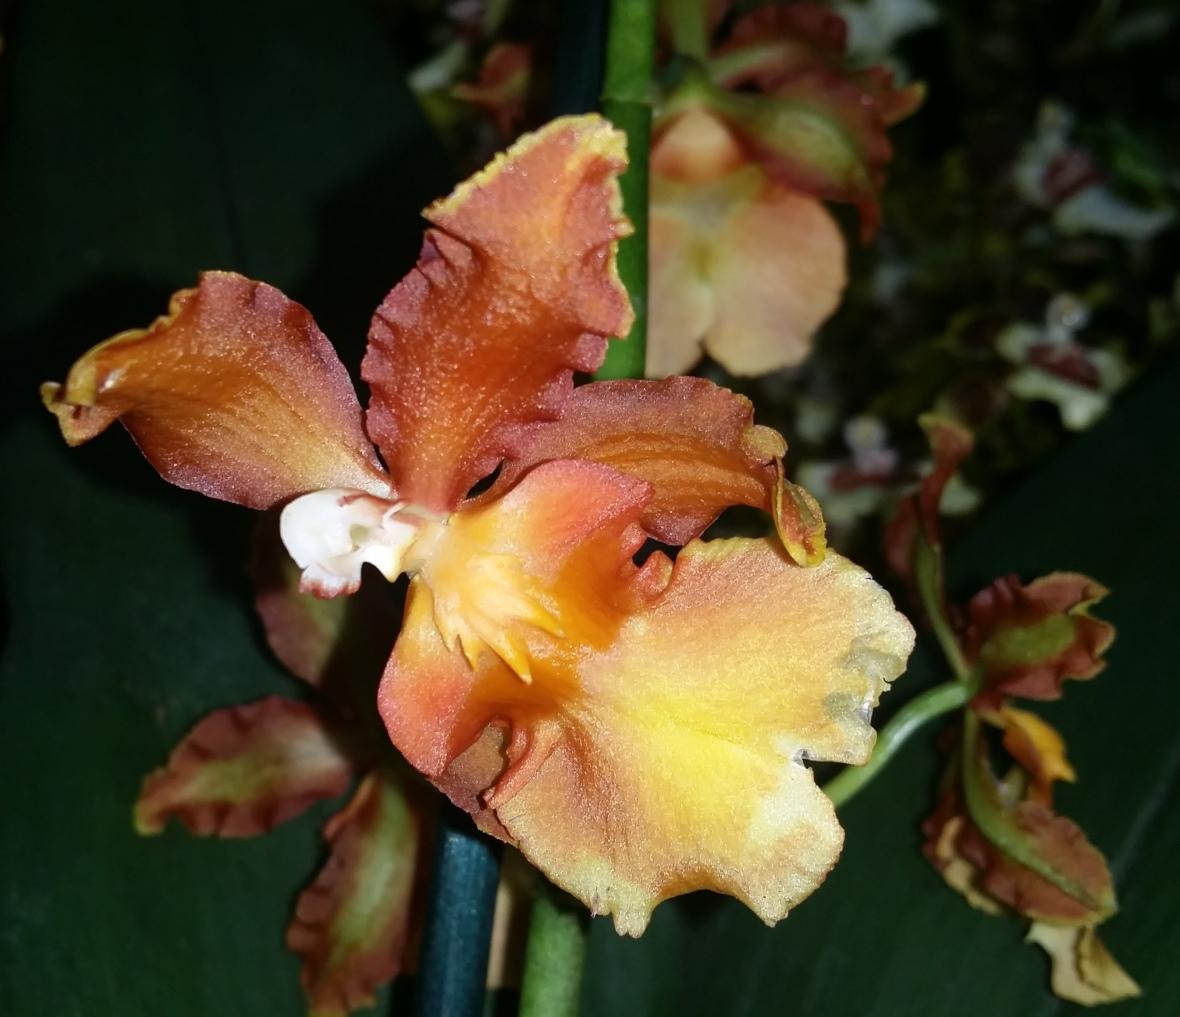 Golden Brown & Yellow Oncidium Orchid